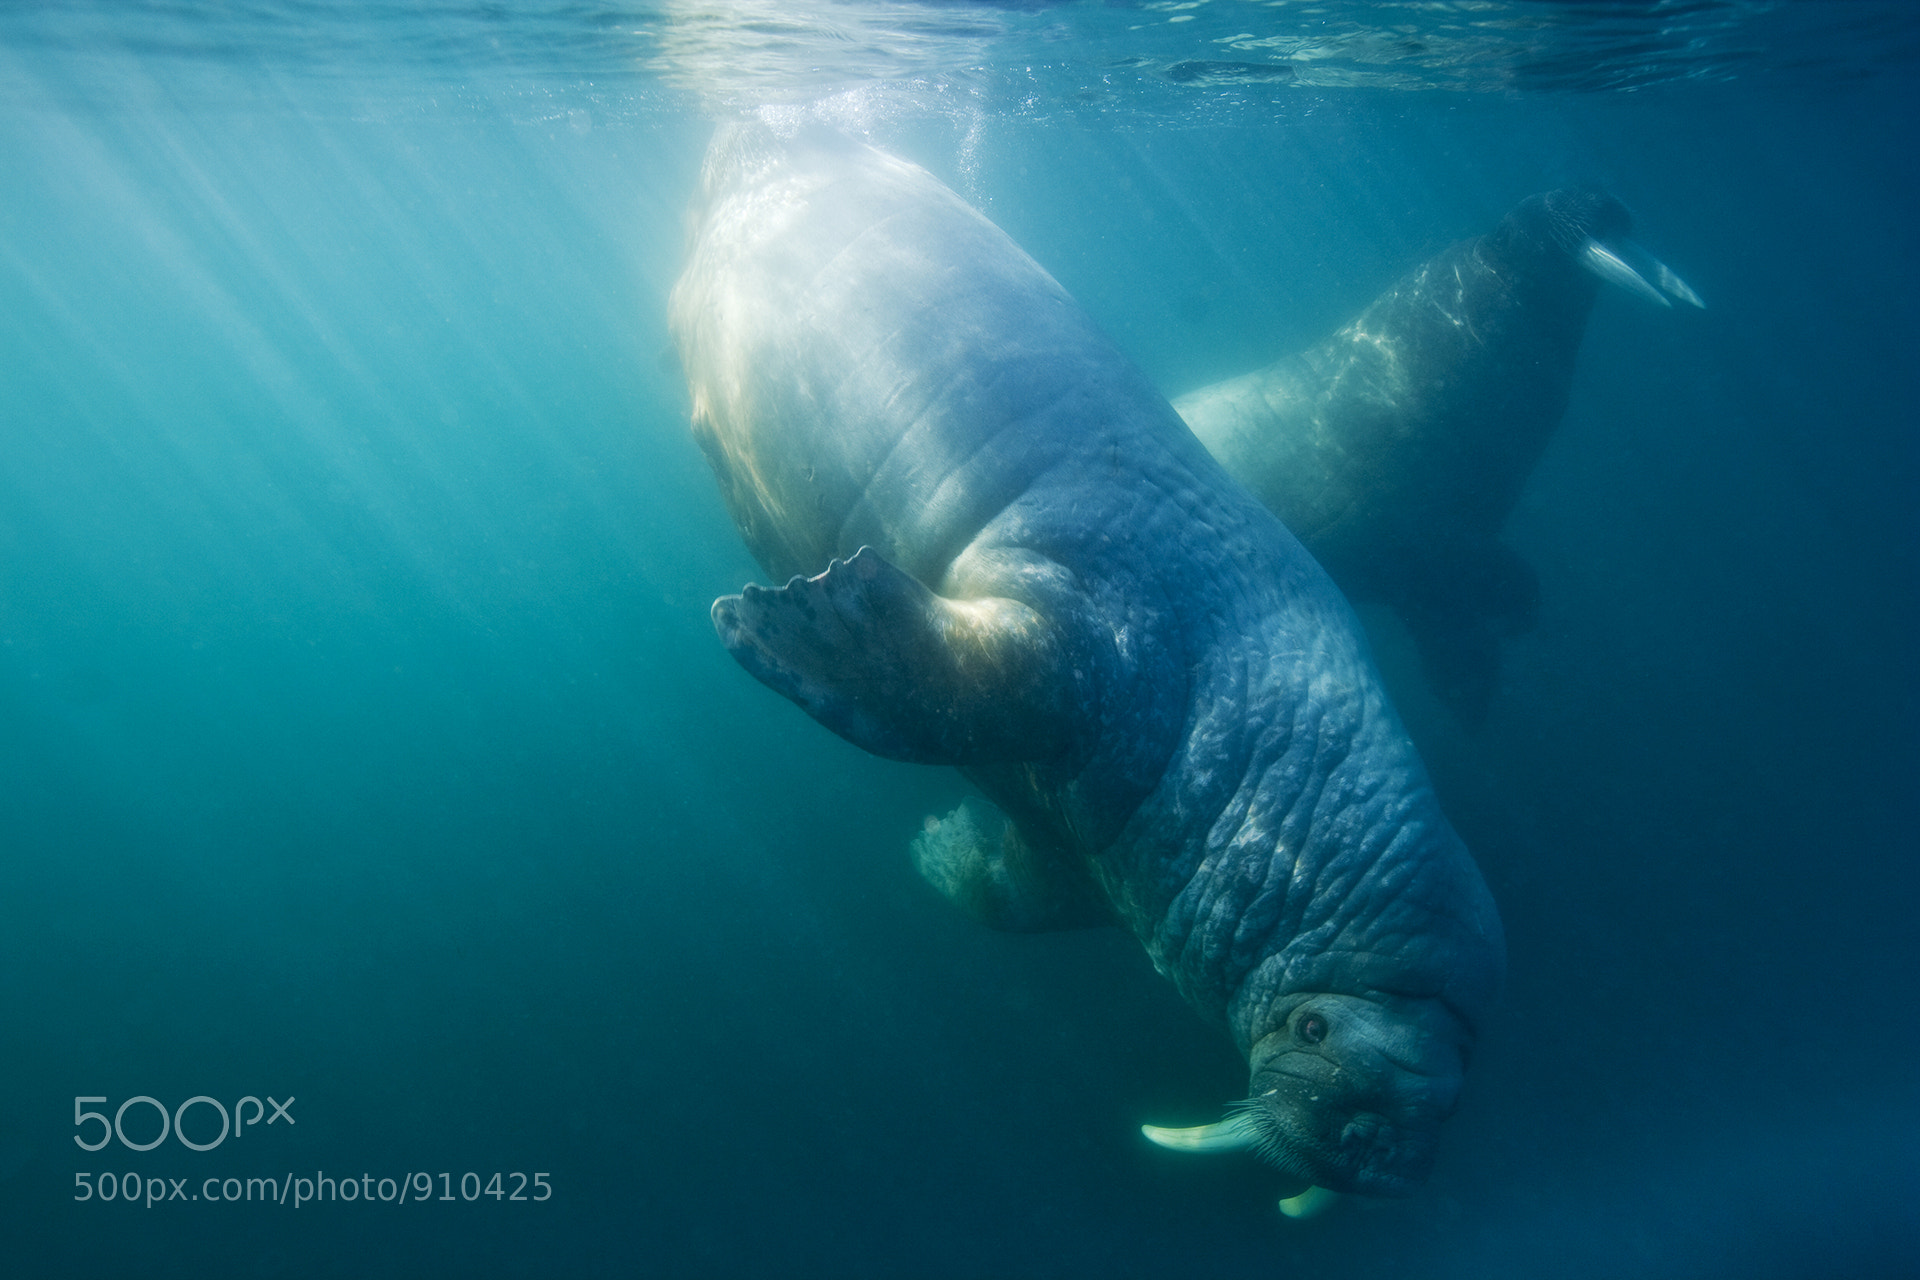 Photograph Underwater Walrus by Paul Souders | WorldFoto on 500px